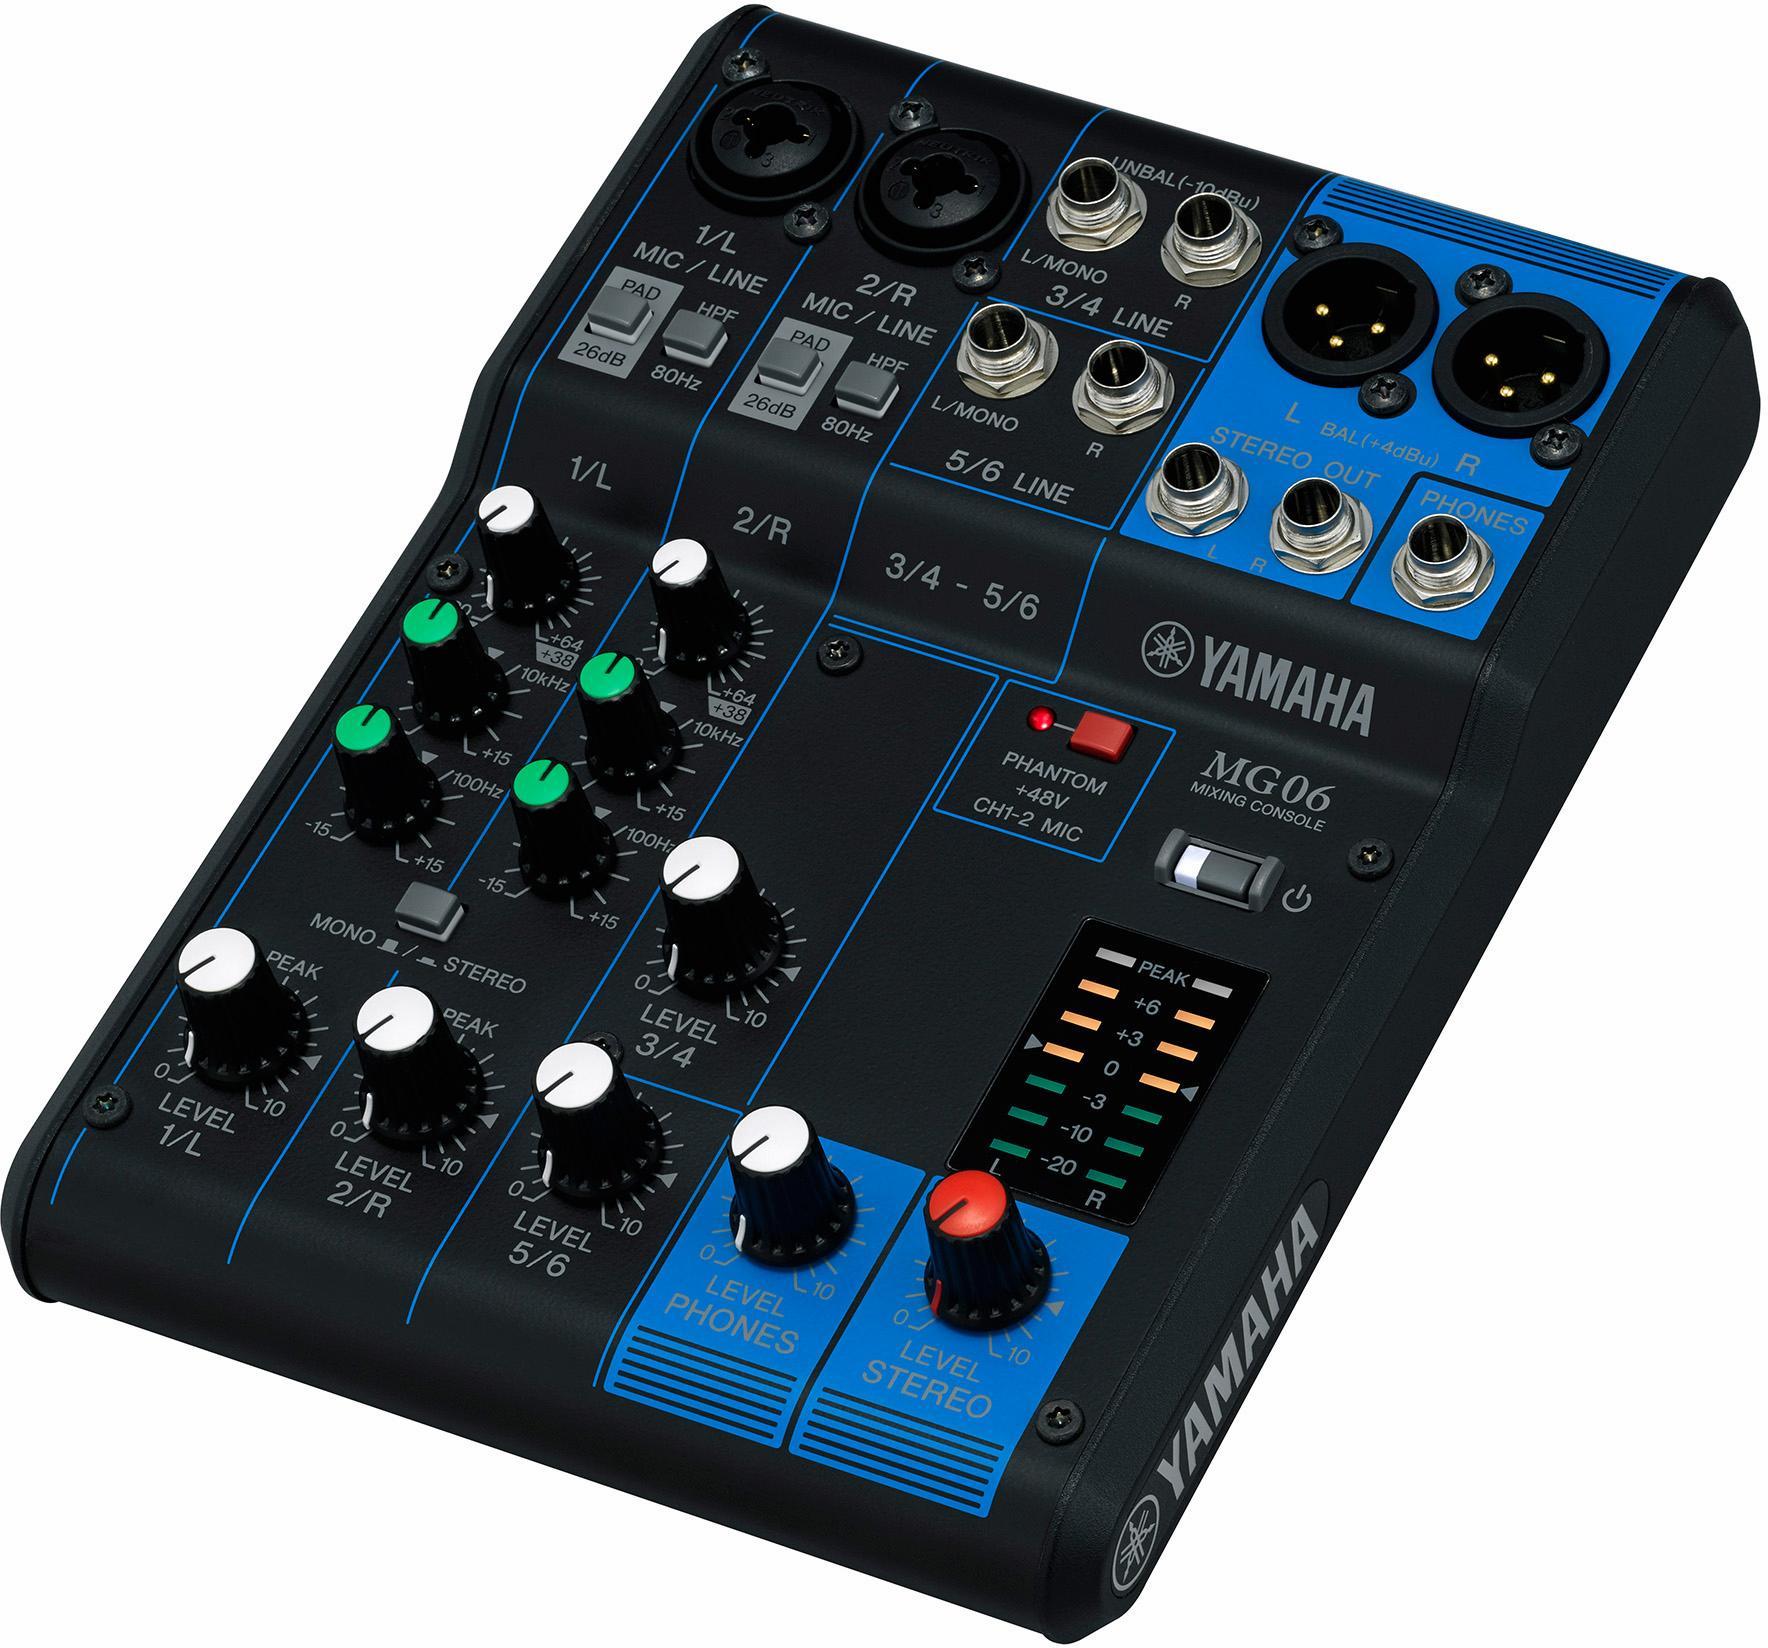 "Yamaha Mischpult ""6-Kanal Mischpultkonsole MG06"" Technik & Freizeit/Technik/Audio, MP3, Musik/DJ Equipment/Mischpulte"